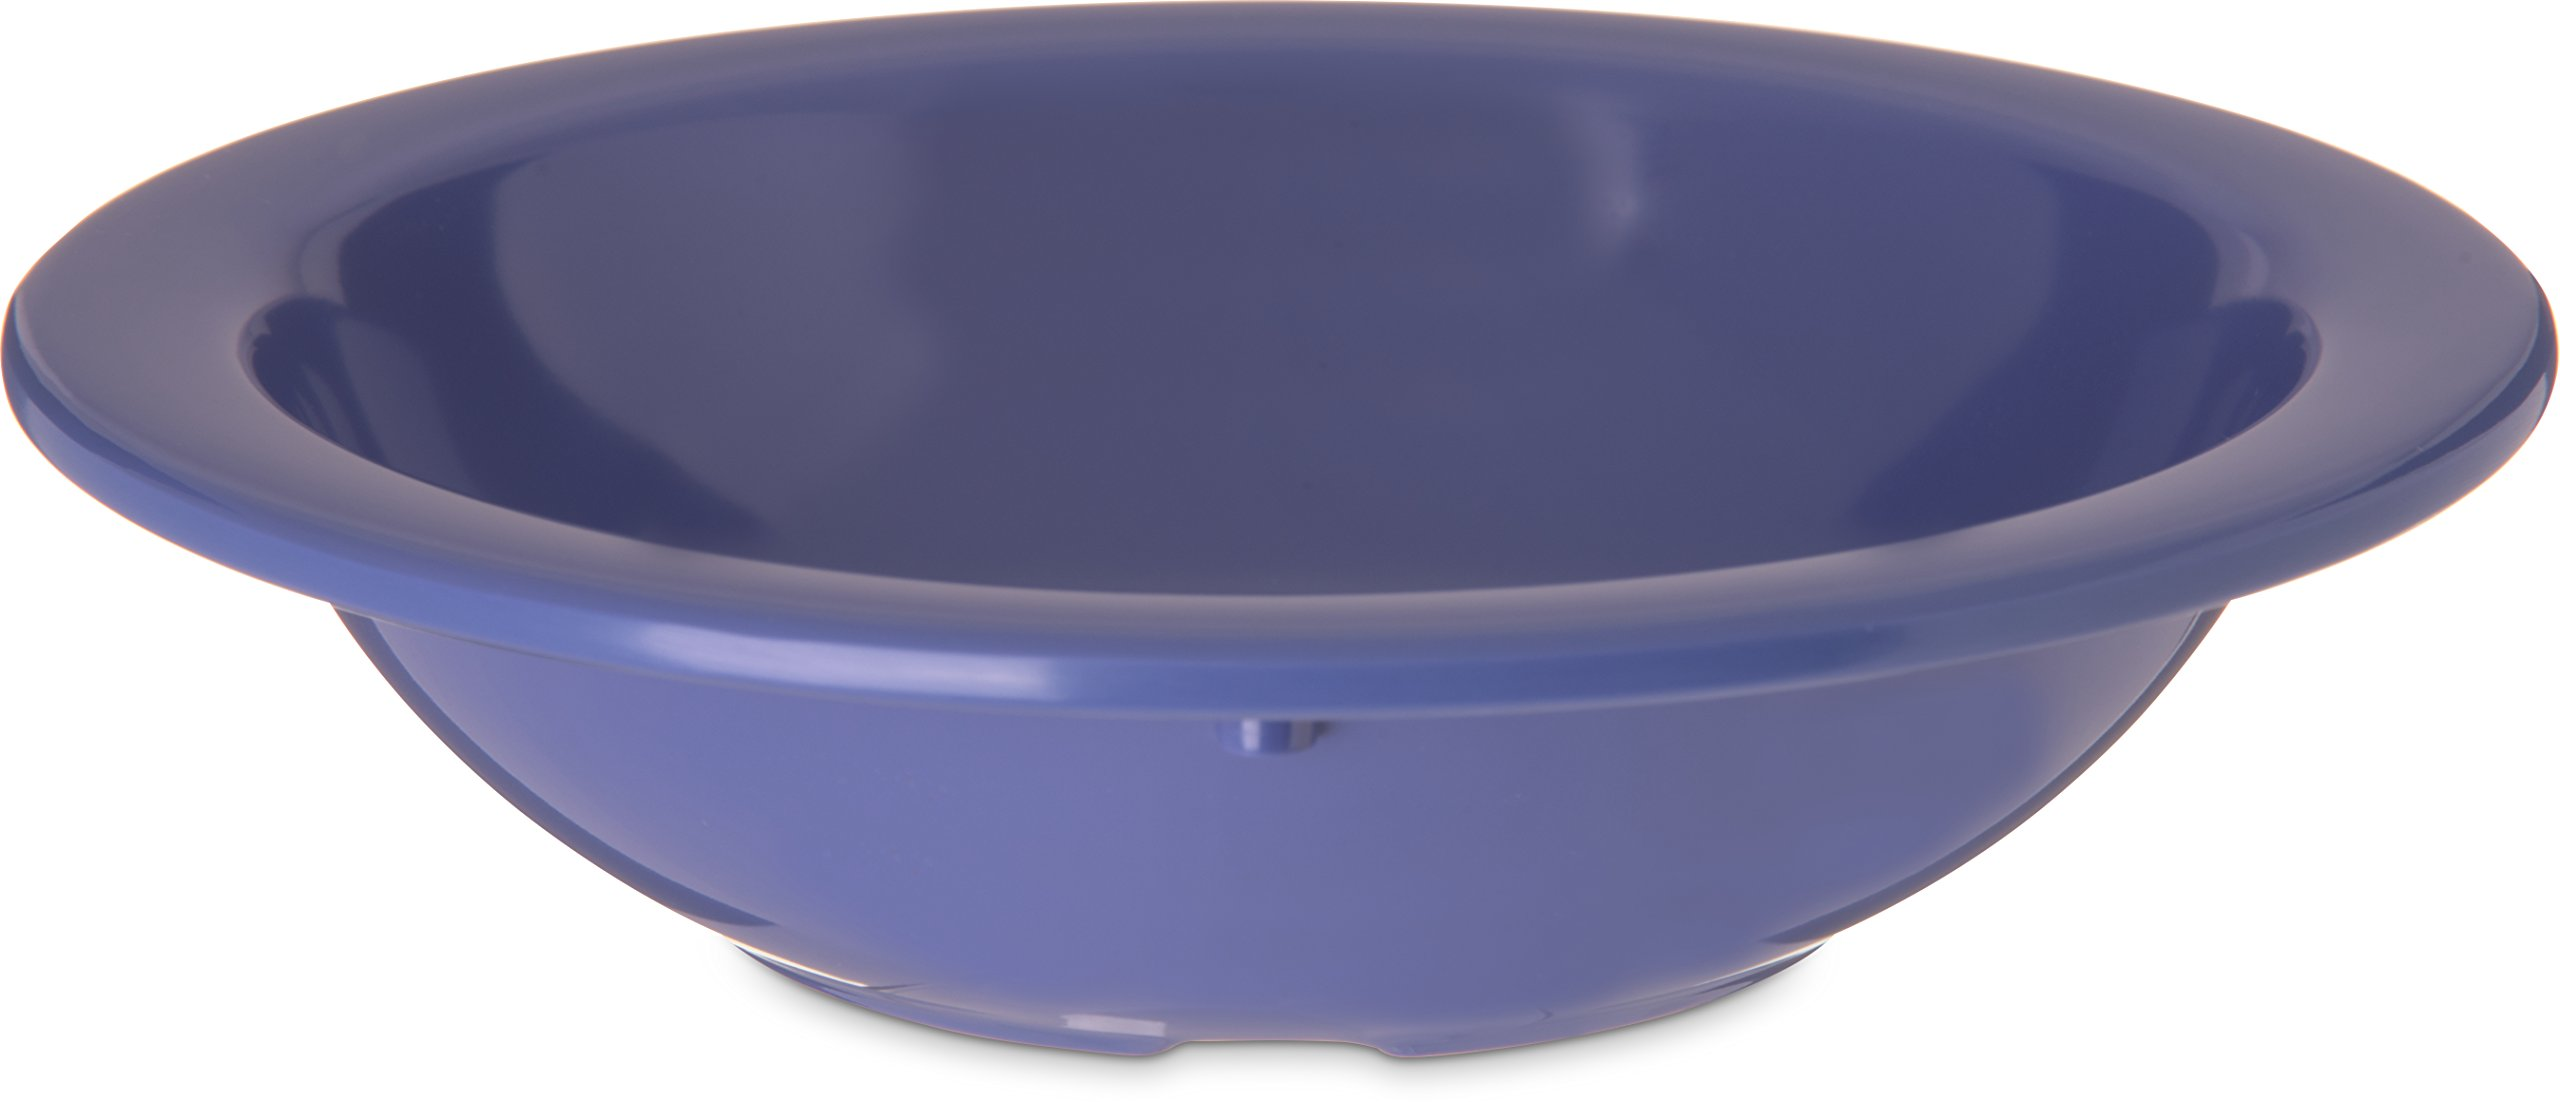 Carlisle 4352914 Dallas Ware Melamine Grapefruit Bowl, 10oz Capacity, 5.95'' Diameter x 1.54'' Depth, Blue (Case of 48)